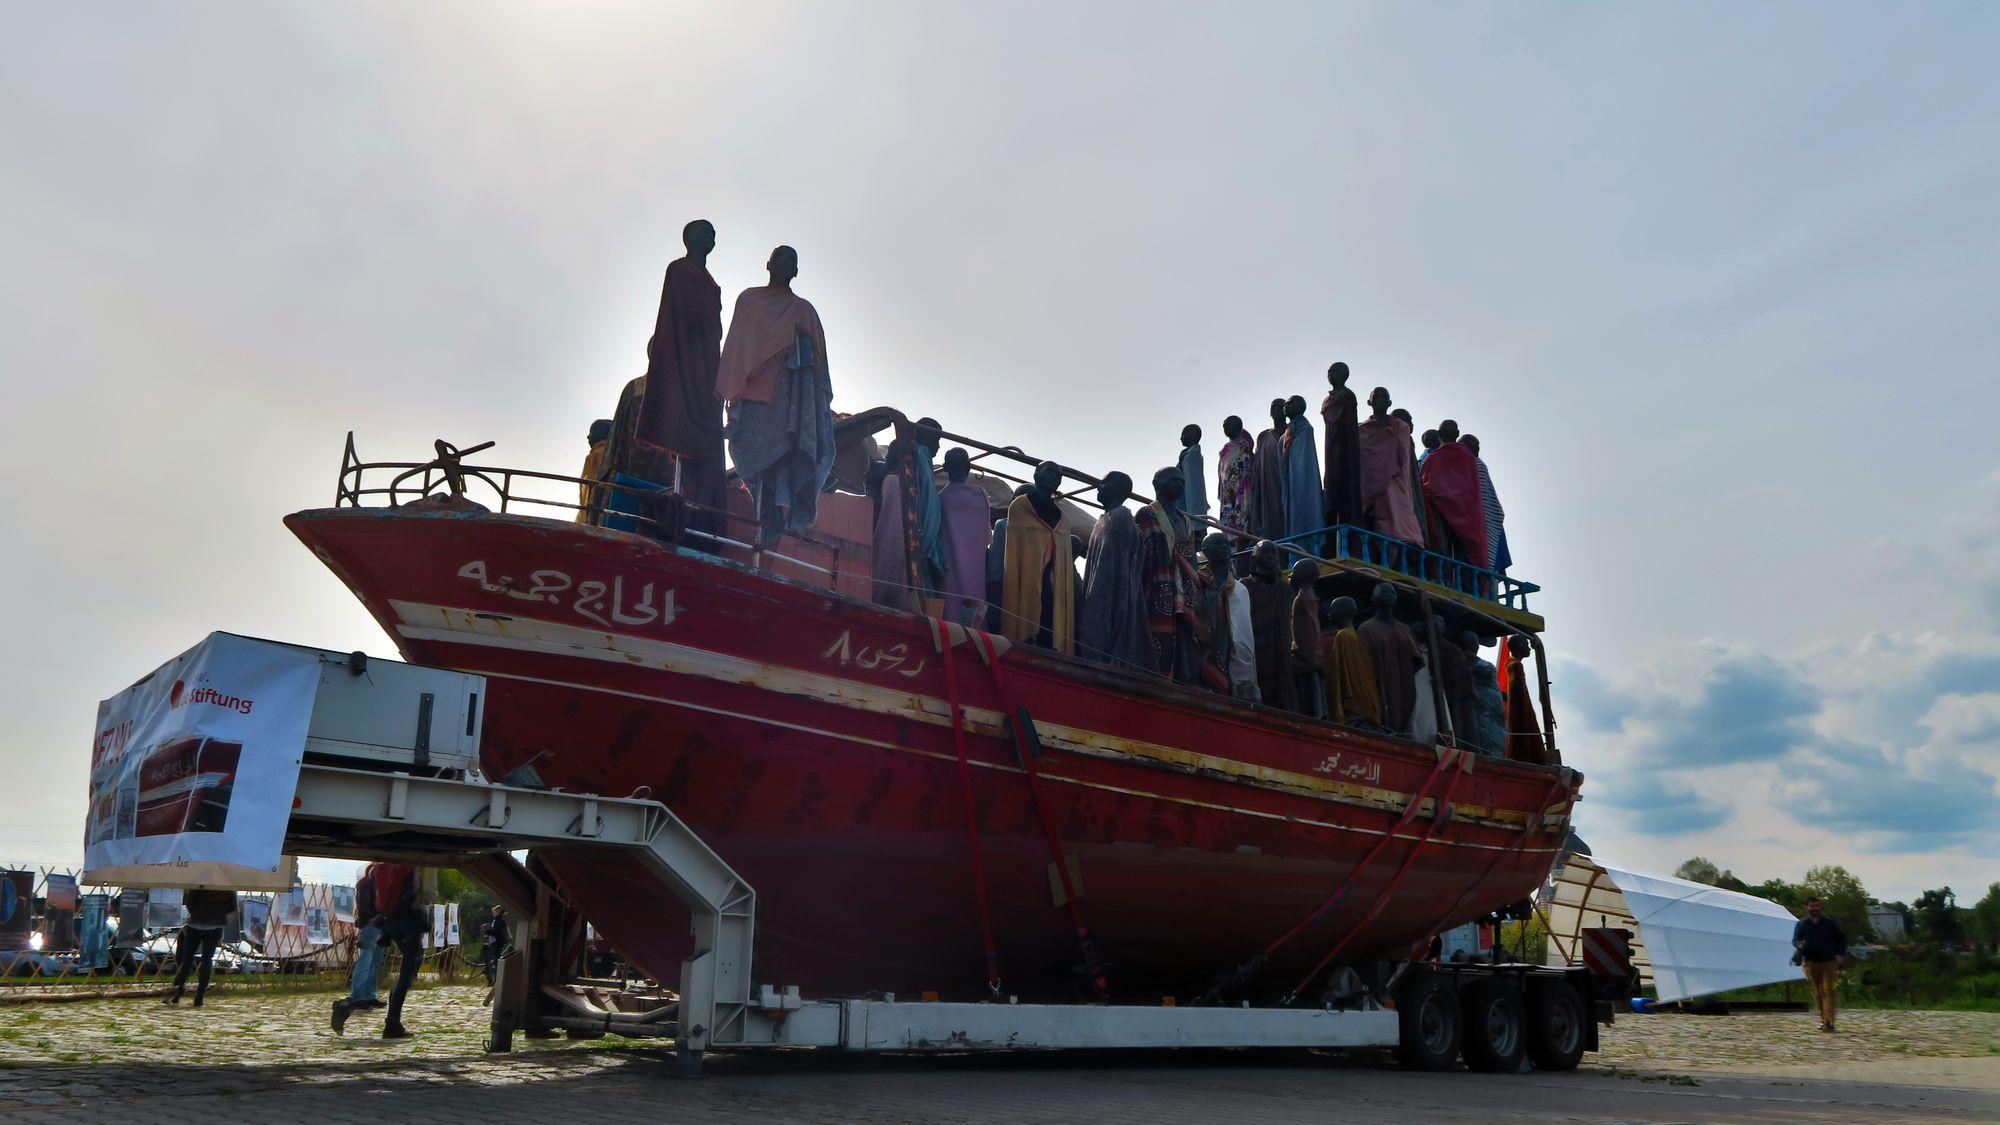 Al-hadj Djumaa am Neustädter Hafen